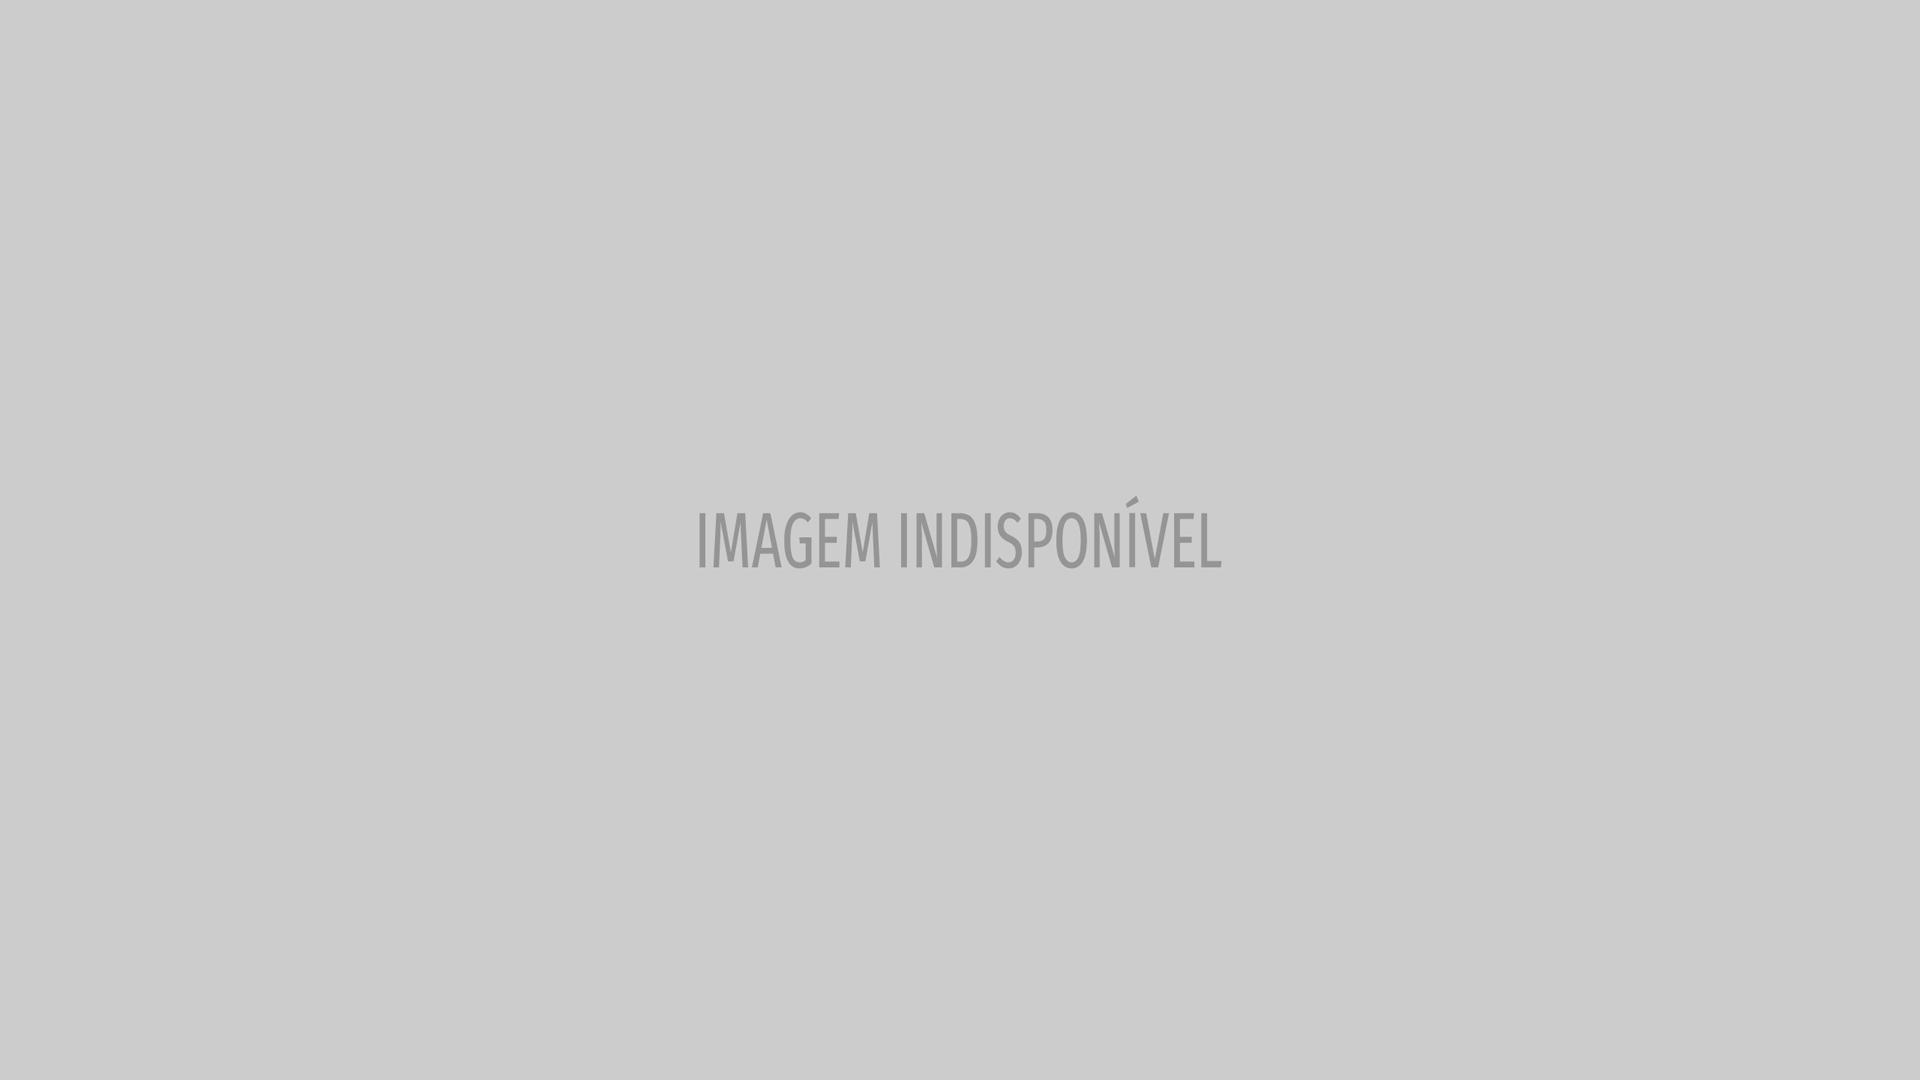 Ronaldo Fenômeno causa desconforto no casamento de Marina Ruy Barbosa